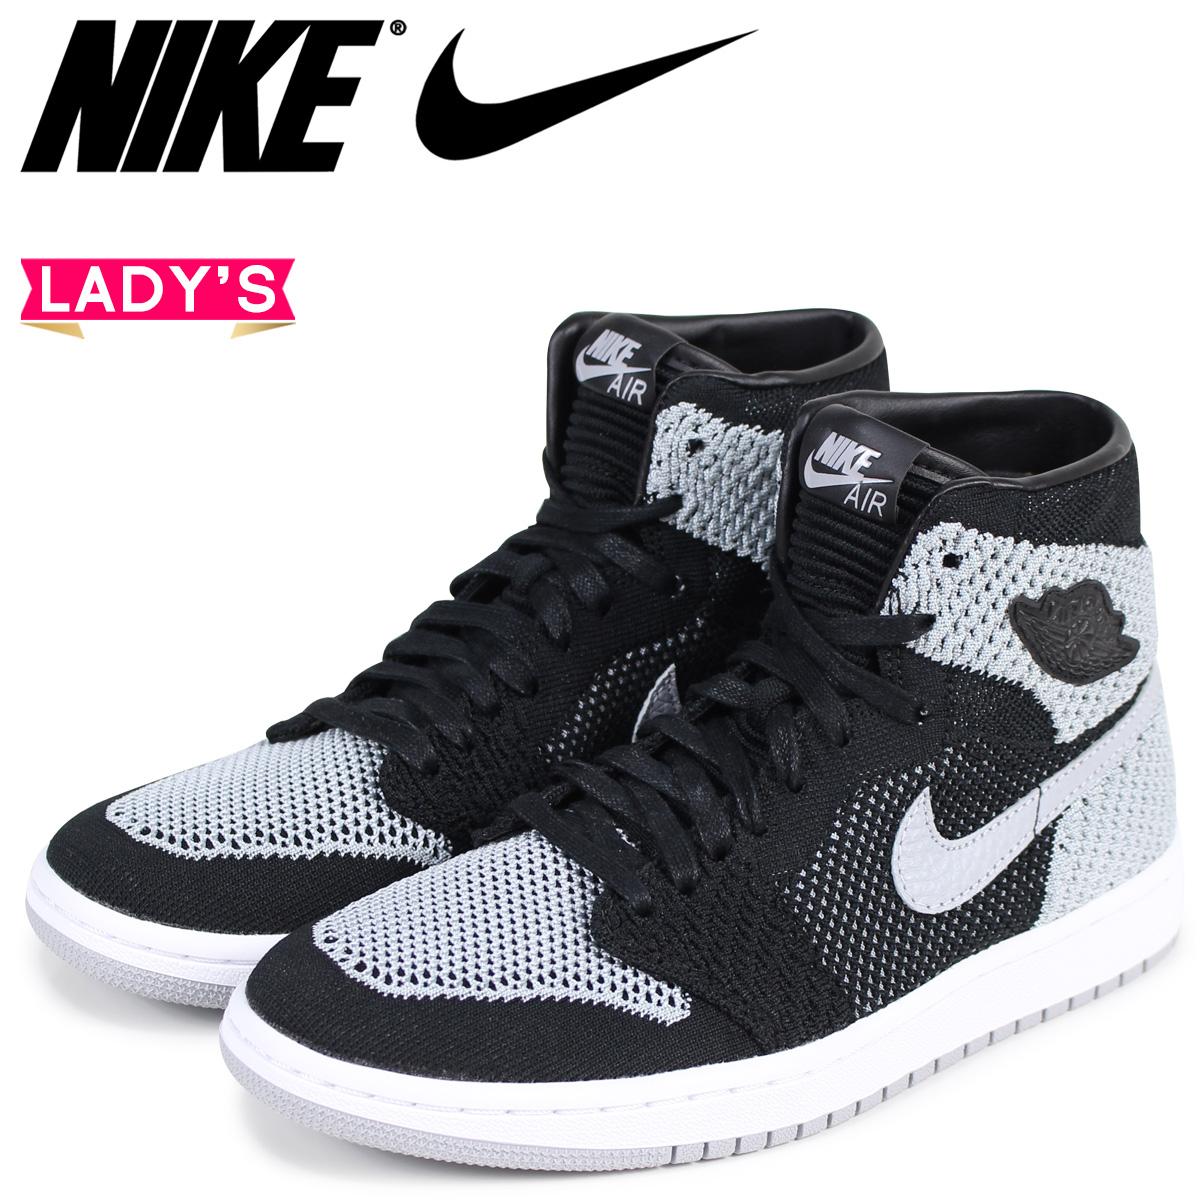 bd37406372731f NIKE Nike Air Jordan 1 nostalgic fried food knit Lady s sneakers AIR JORDAN  1 RETRO HI FLYNIT BG 919